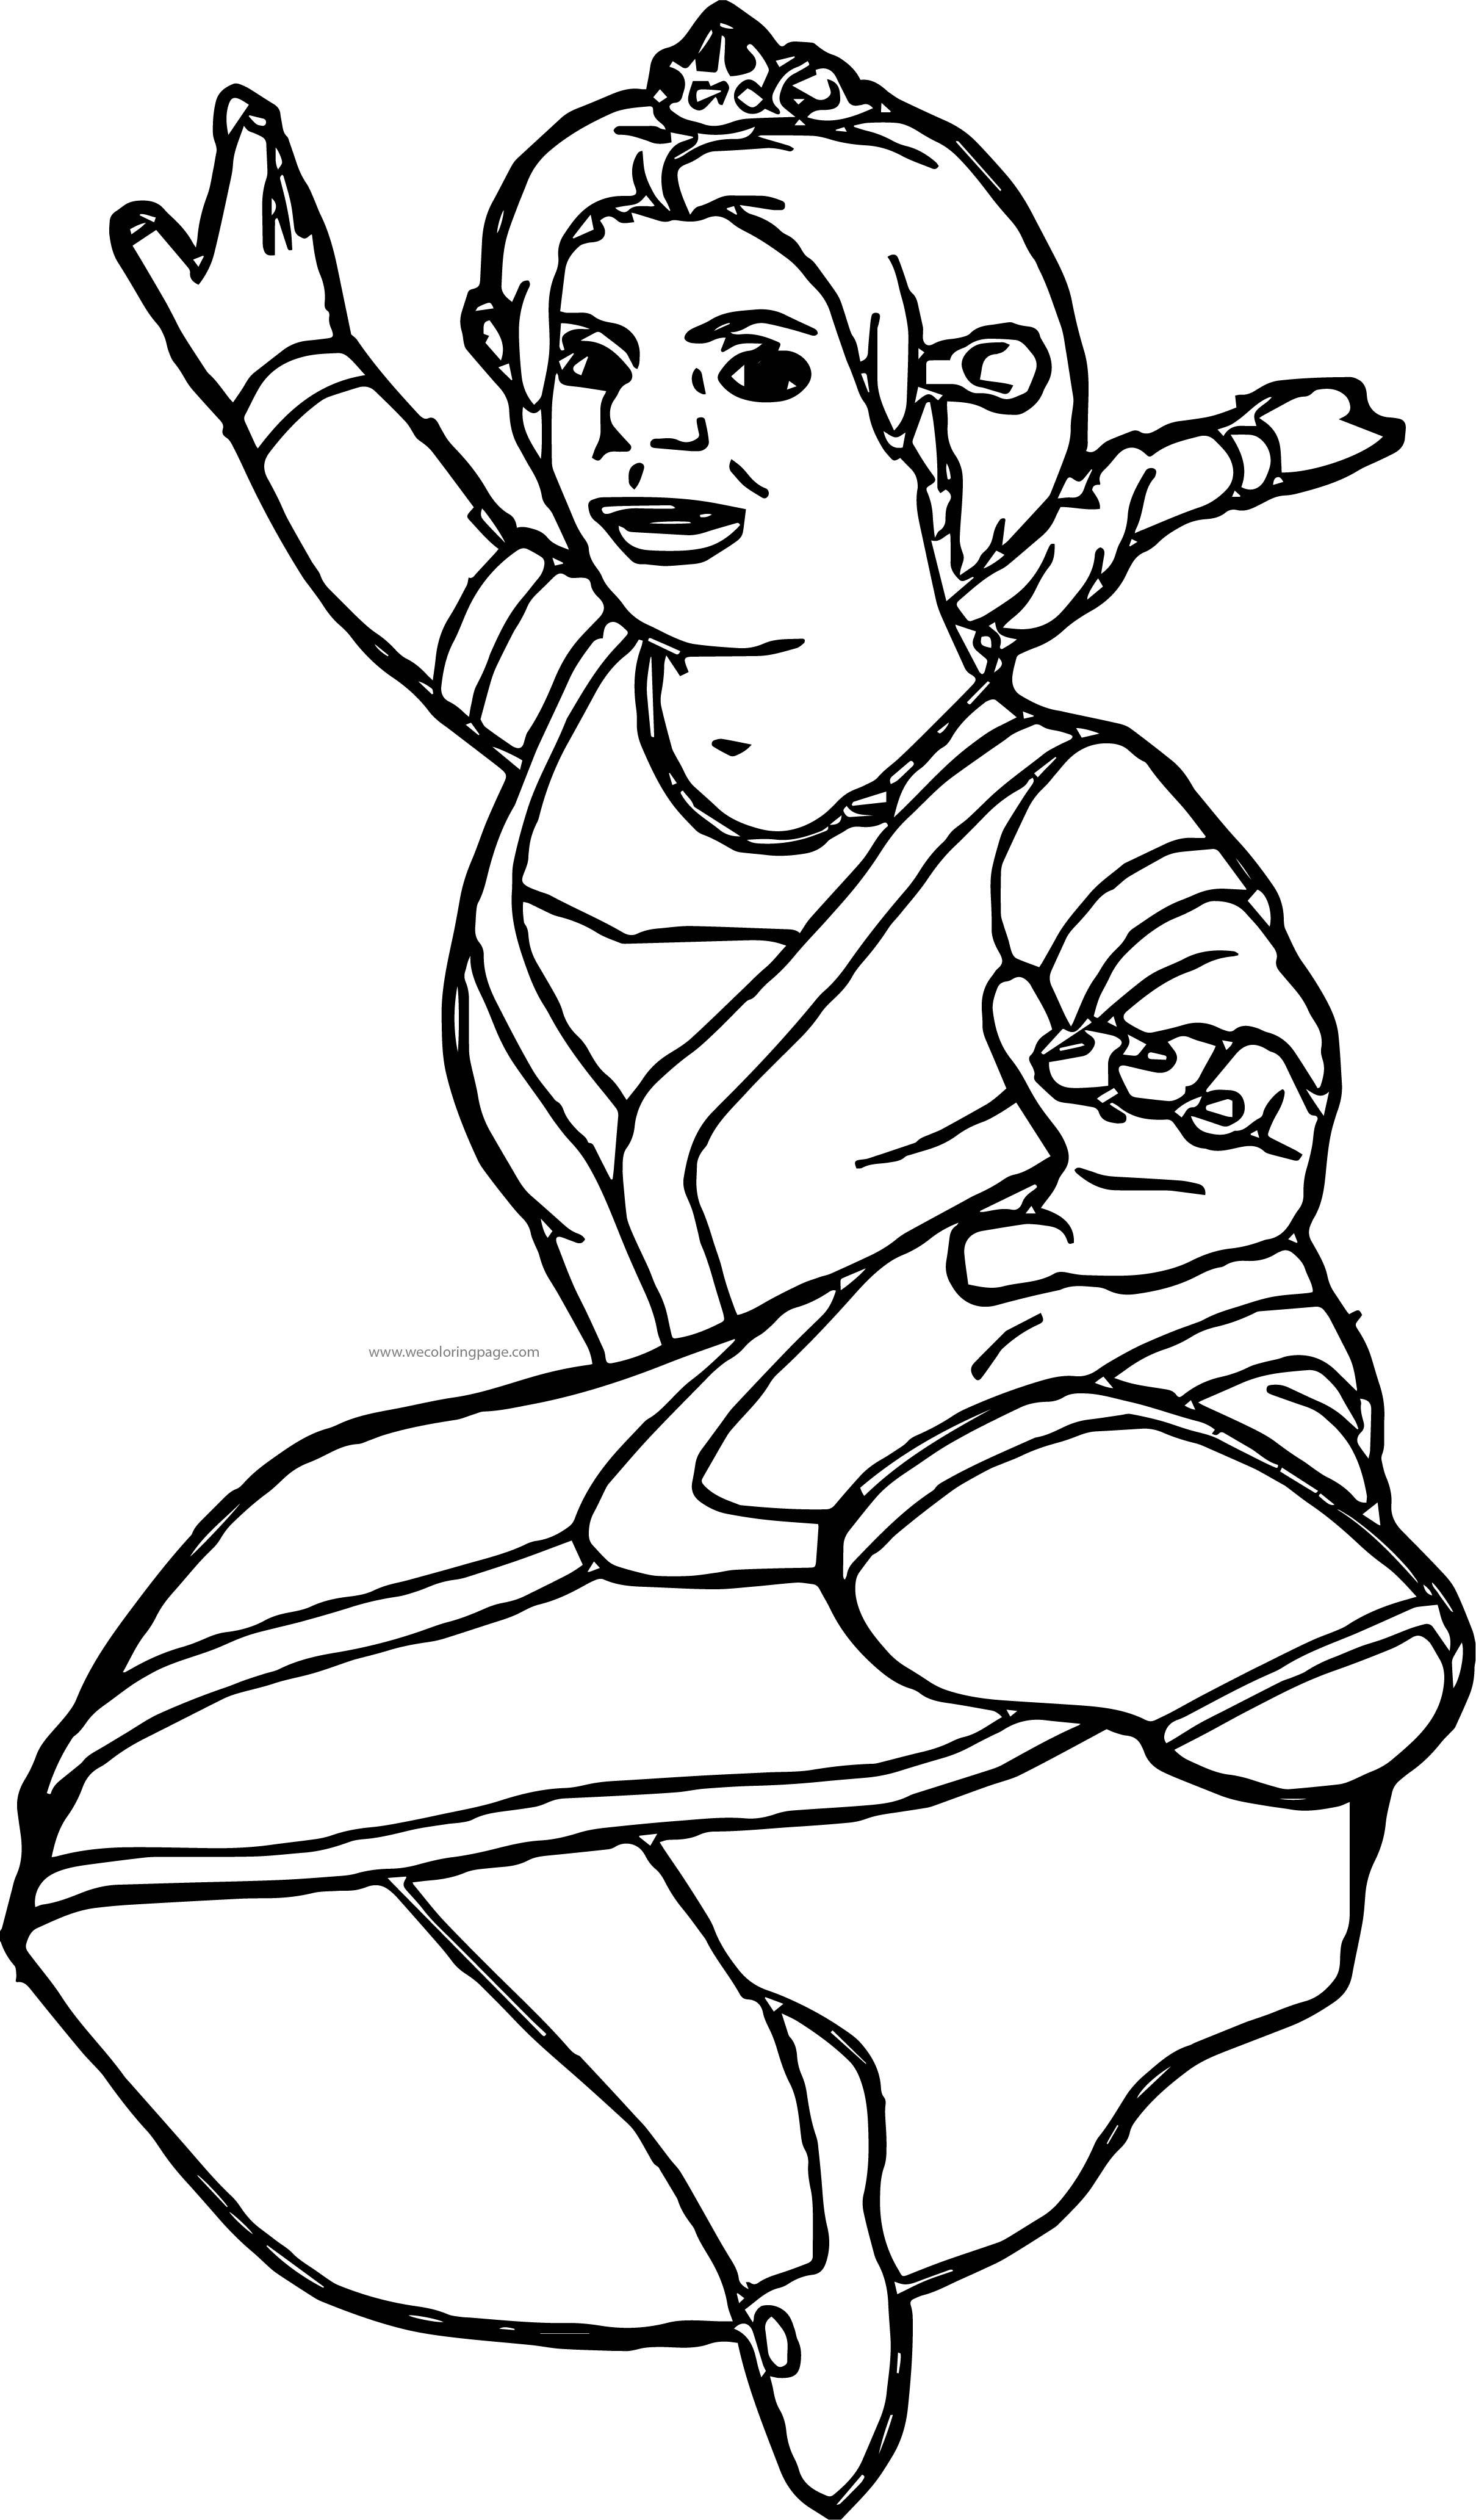 Shrek Girl Kick Coloring Page